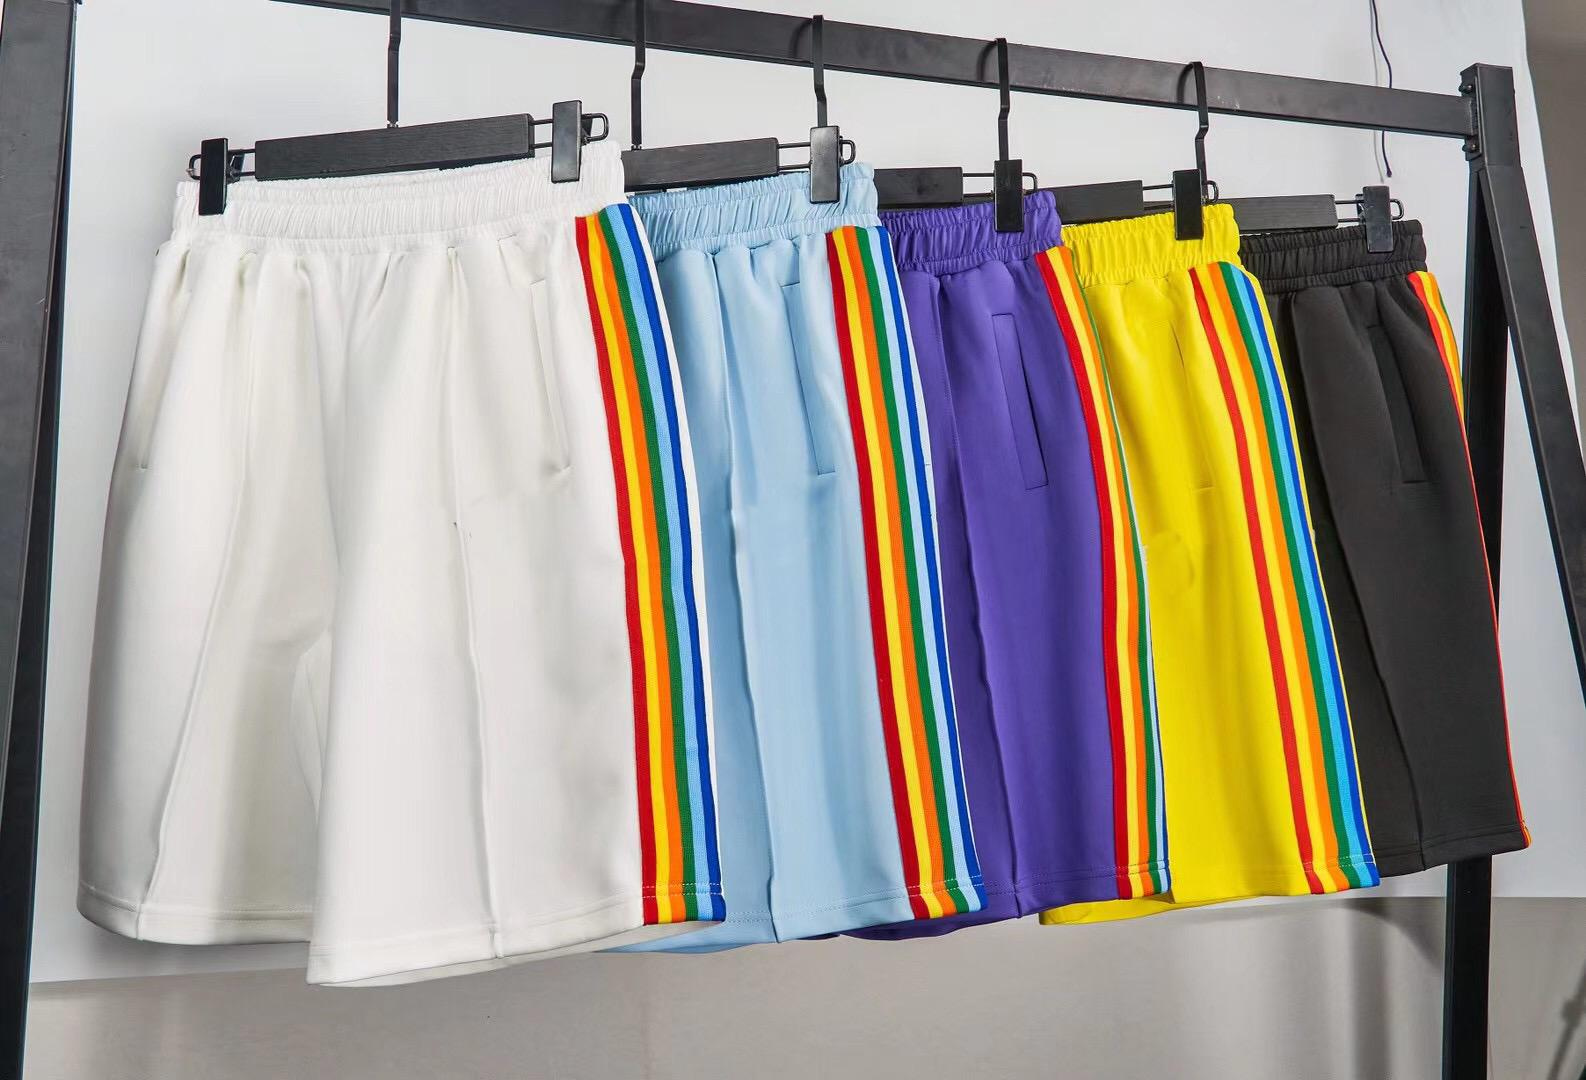 21SS GooD Qaulity 디자이너 반바지 높은 거리 짧은 바지 남성 여름 스포츠 스웨트 팬츠 힙합 Streetwear Mens 의류 크기 : S-XL PA4248